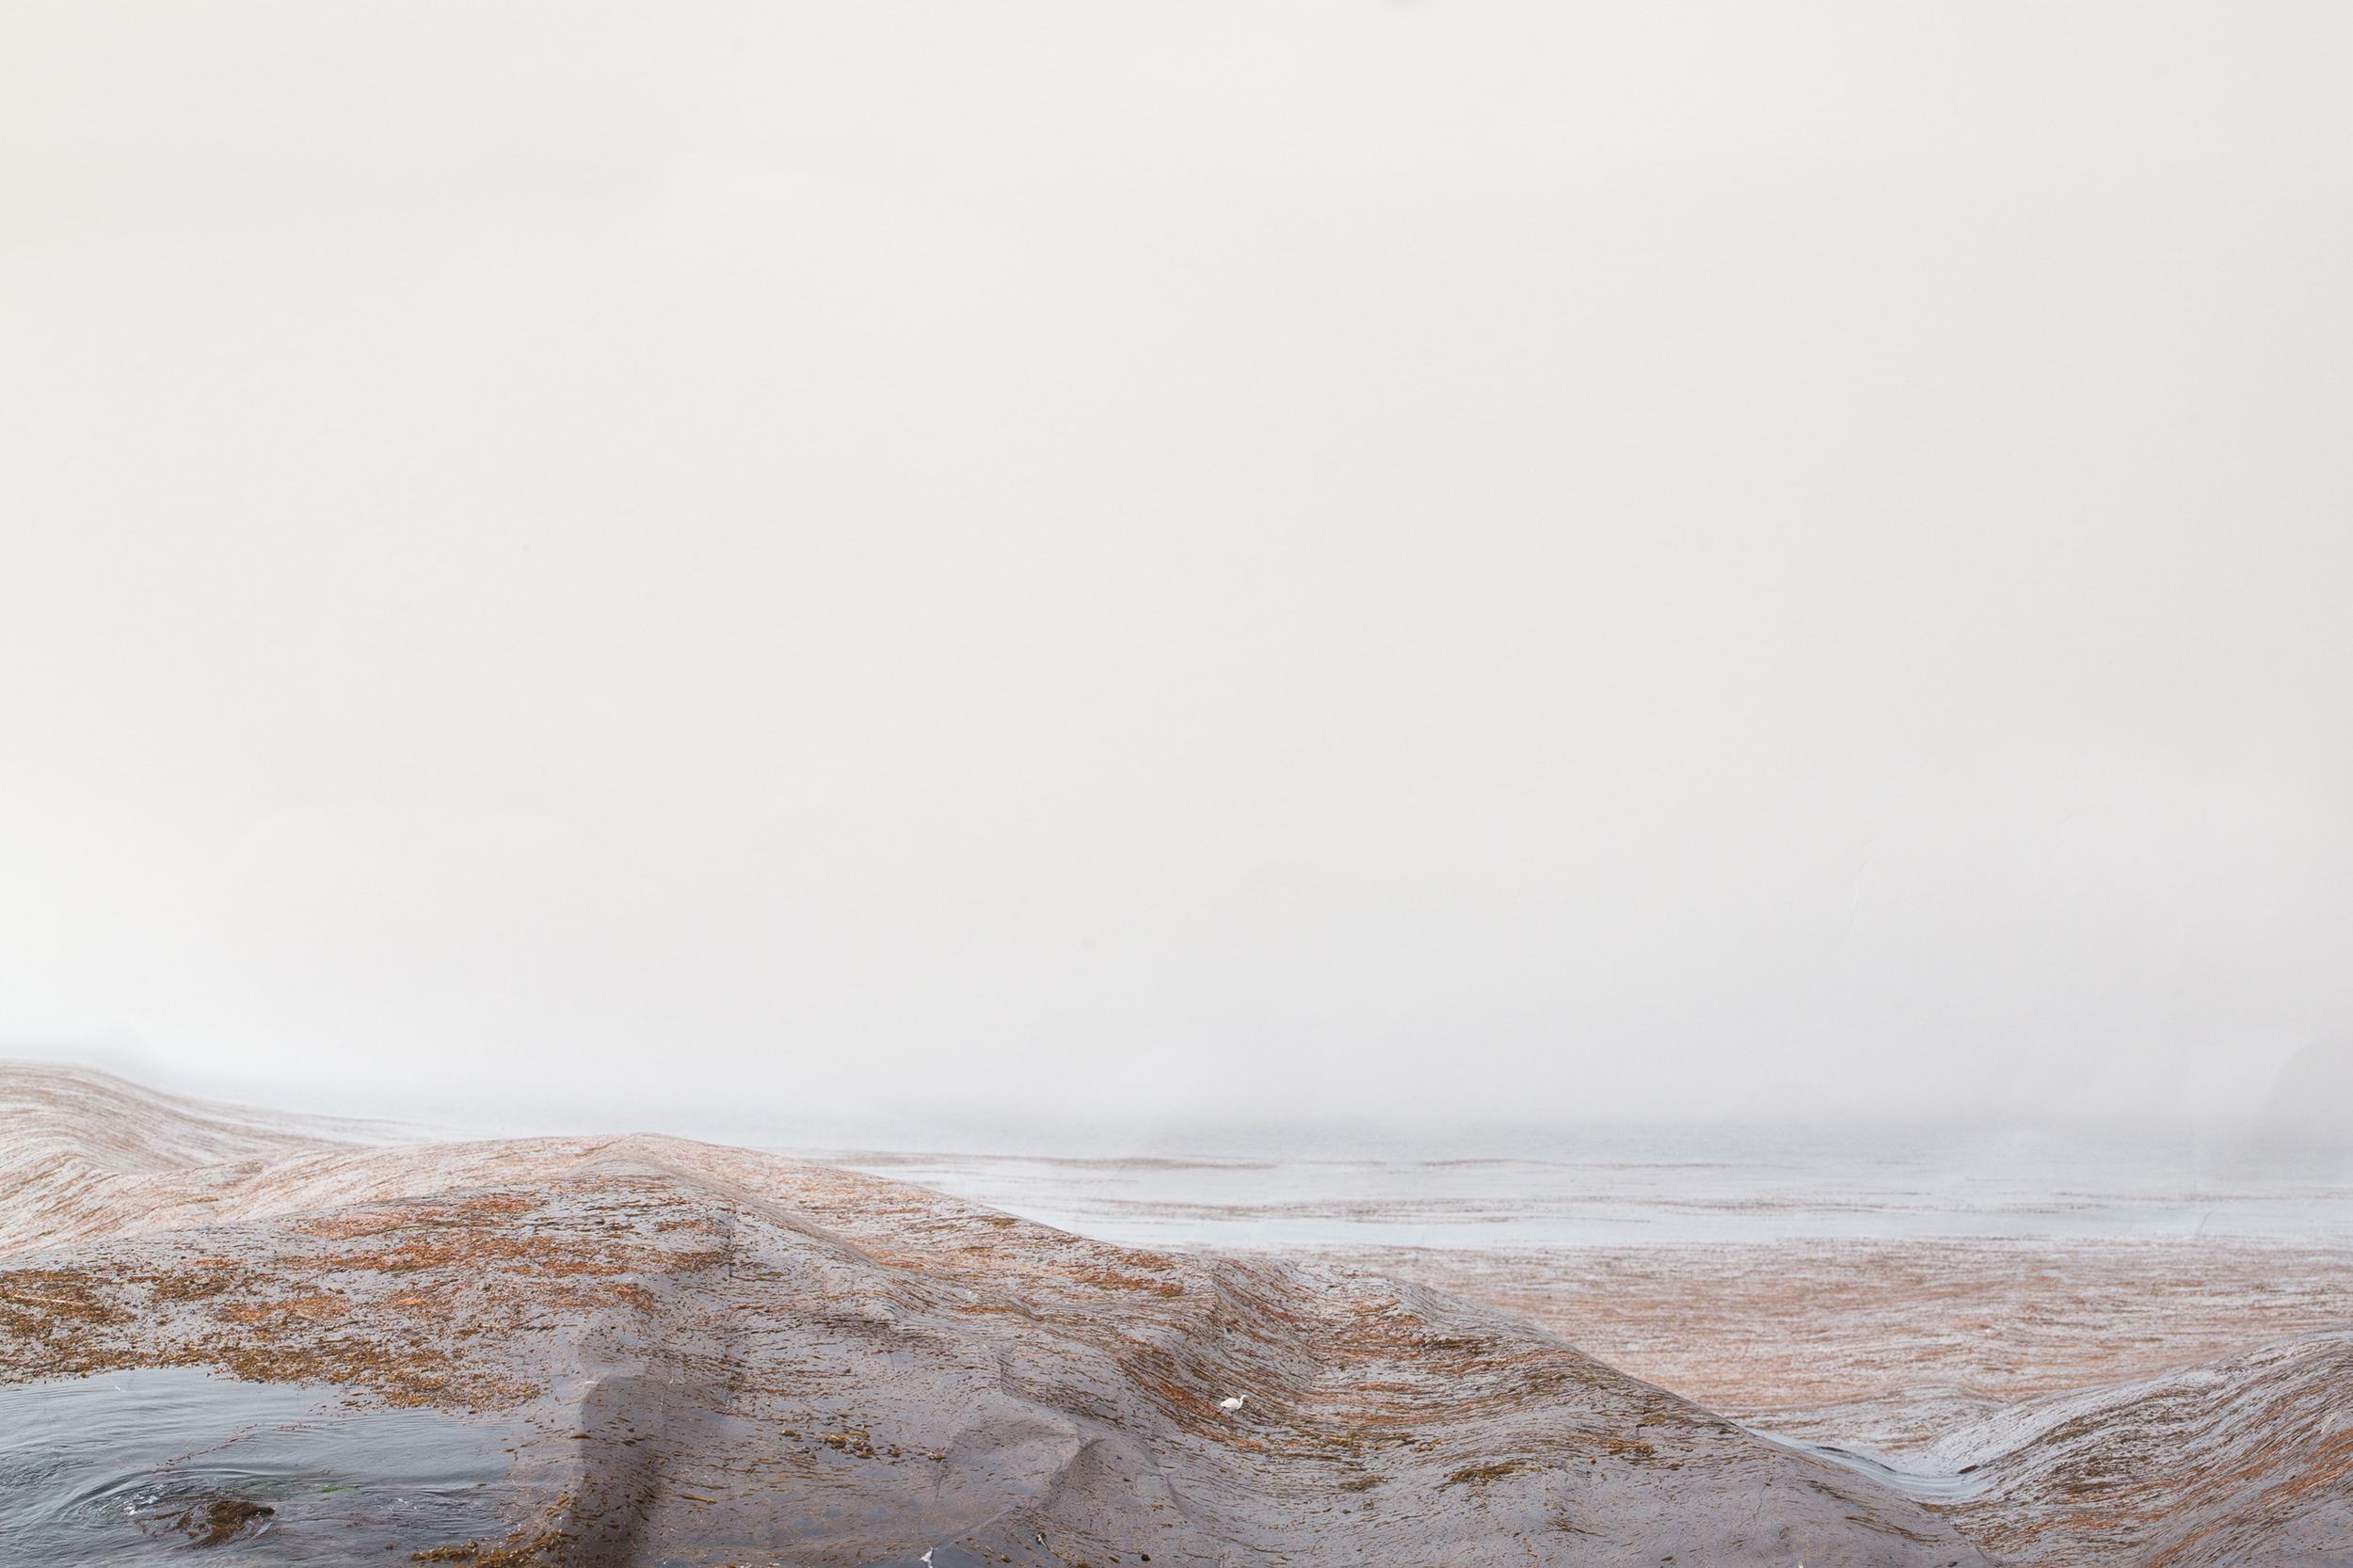 Laura Plageman,  Pacific Grove (Study No. 1) , 2013  Digital pigment print, 8 x 12 in, edition of 5   Inquire